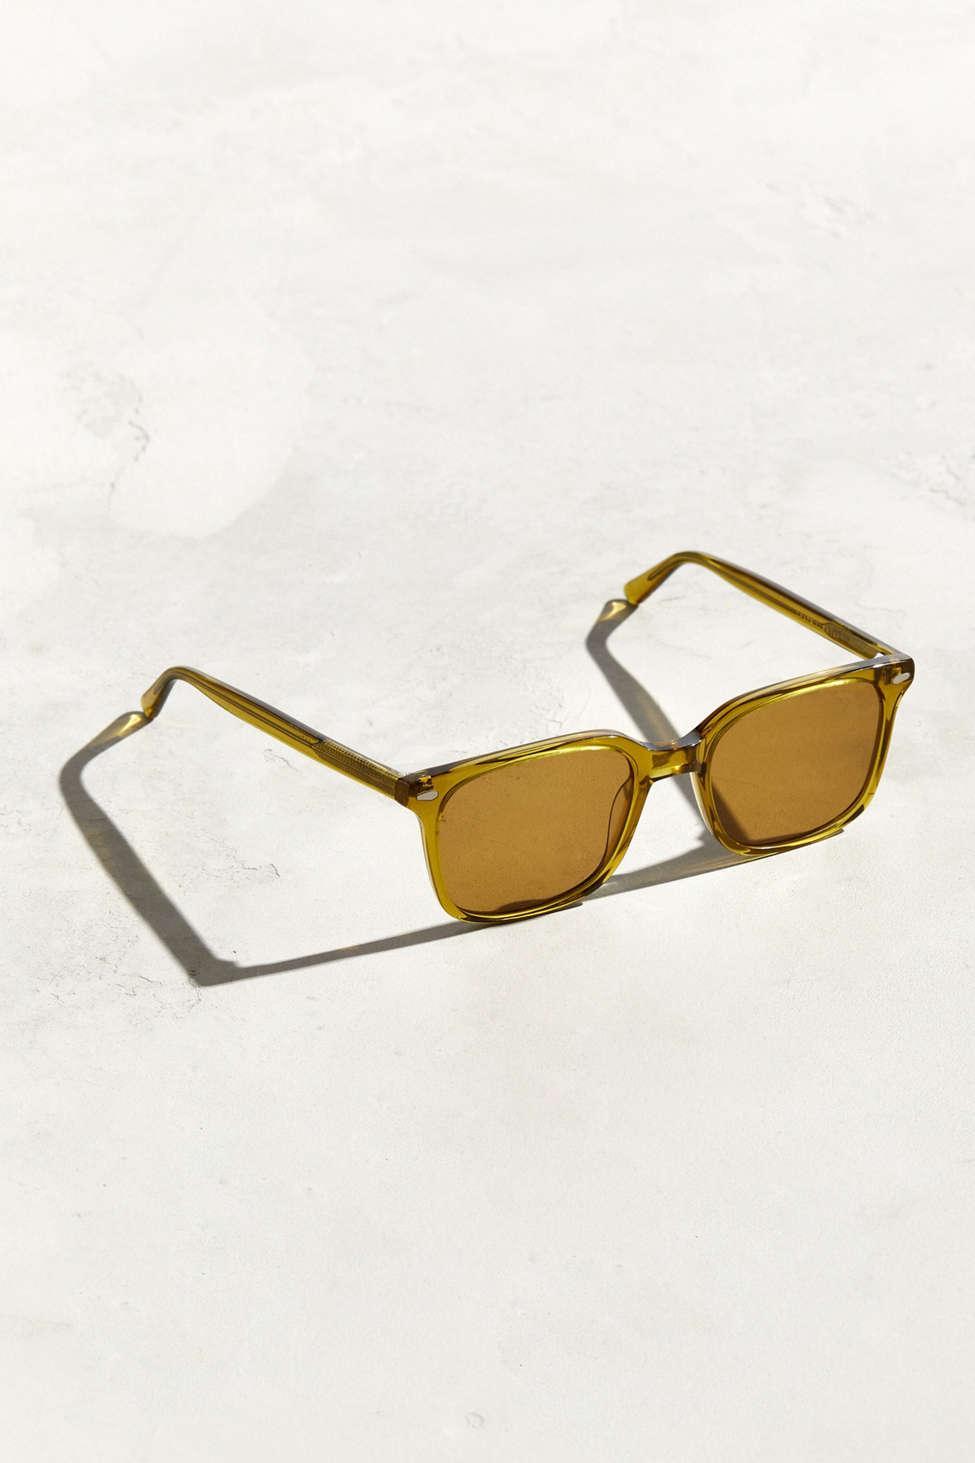 8171f2c0c3 Lyst - Crap Eyewear Conga Jet Sunglasses in Green for Men